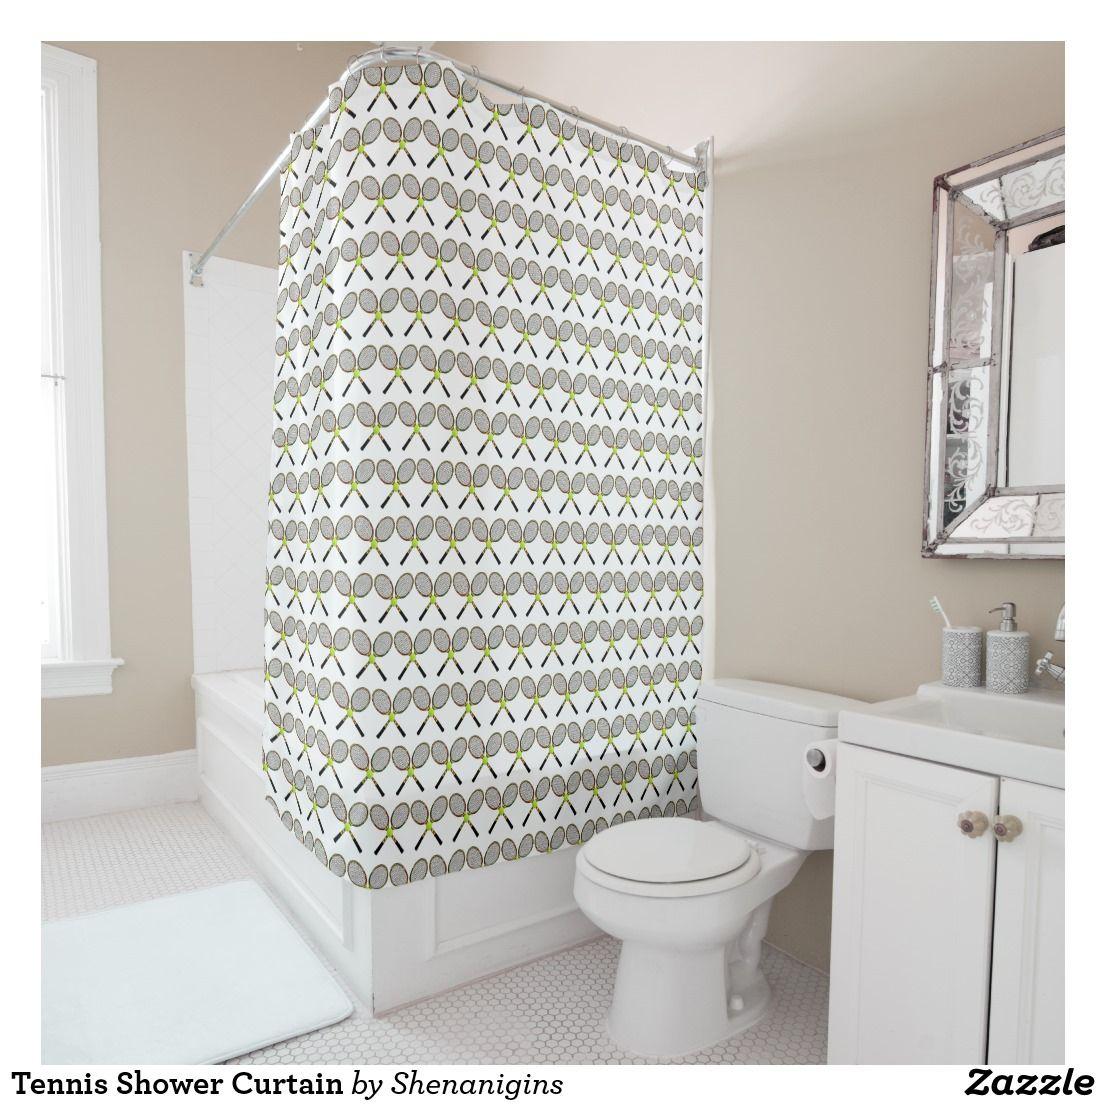 Tennis Shower Curtain Zazzle Com Shower Curtain Cool Shower Curtains Curtains